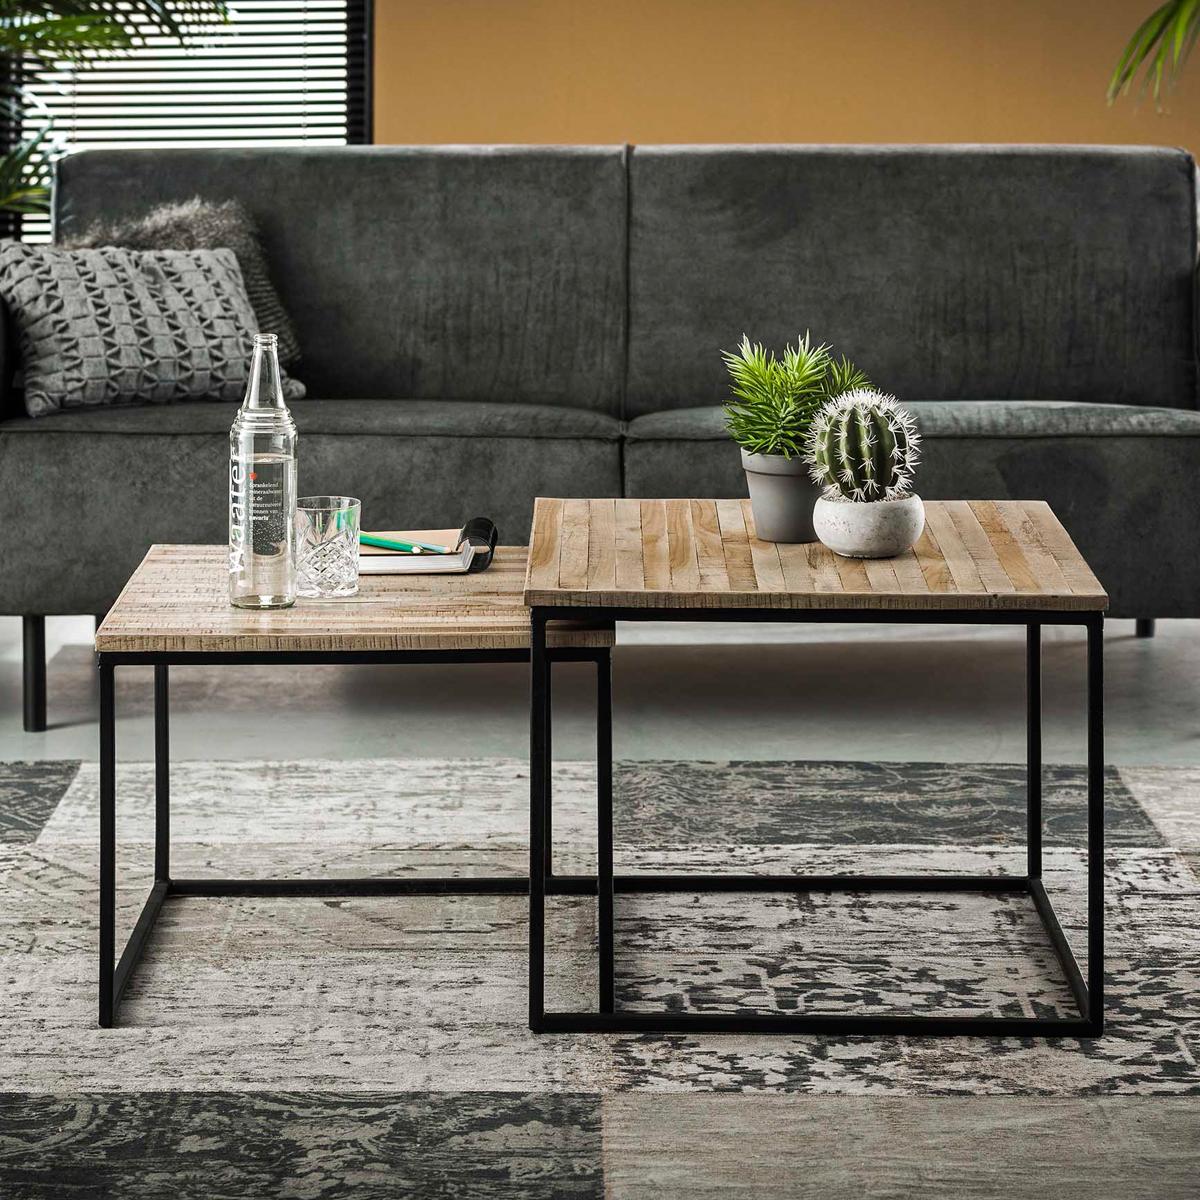 Vierkante salontafelset teakhout 60x60